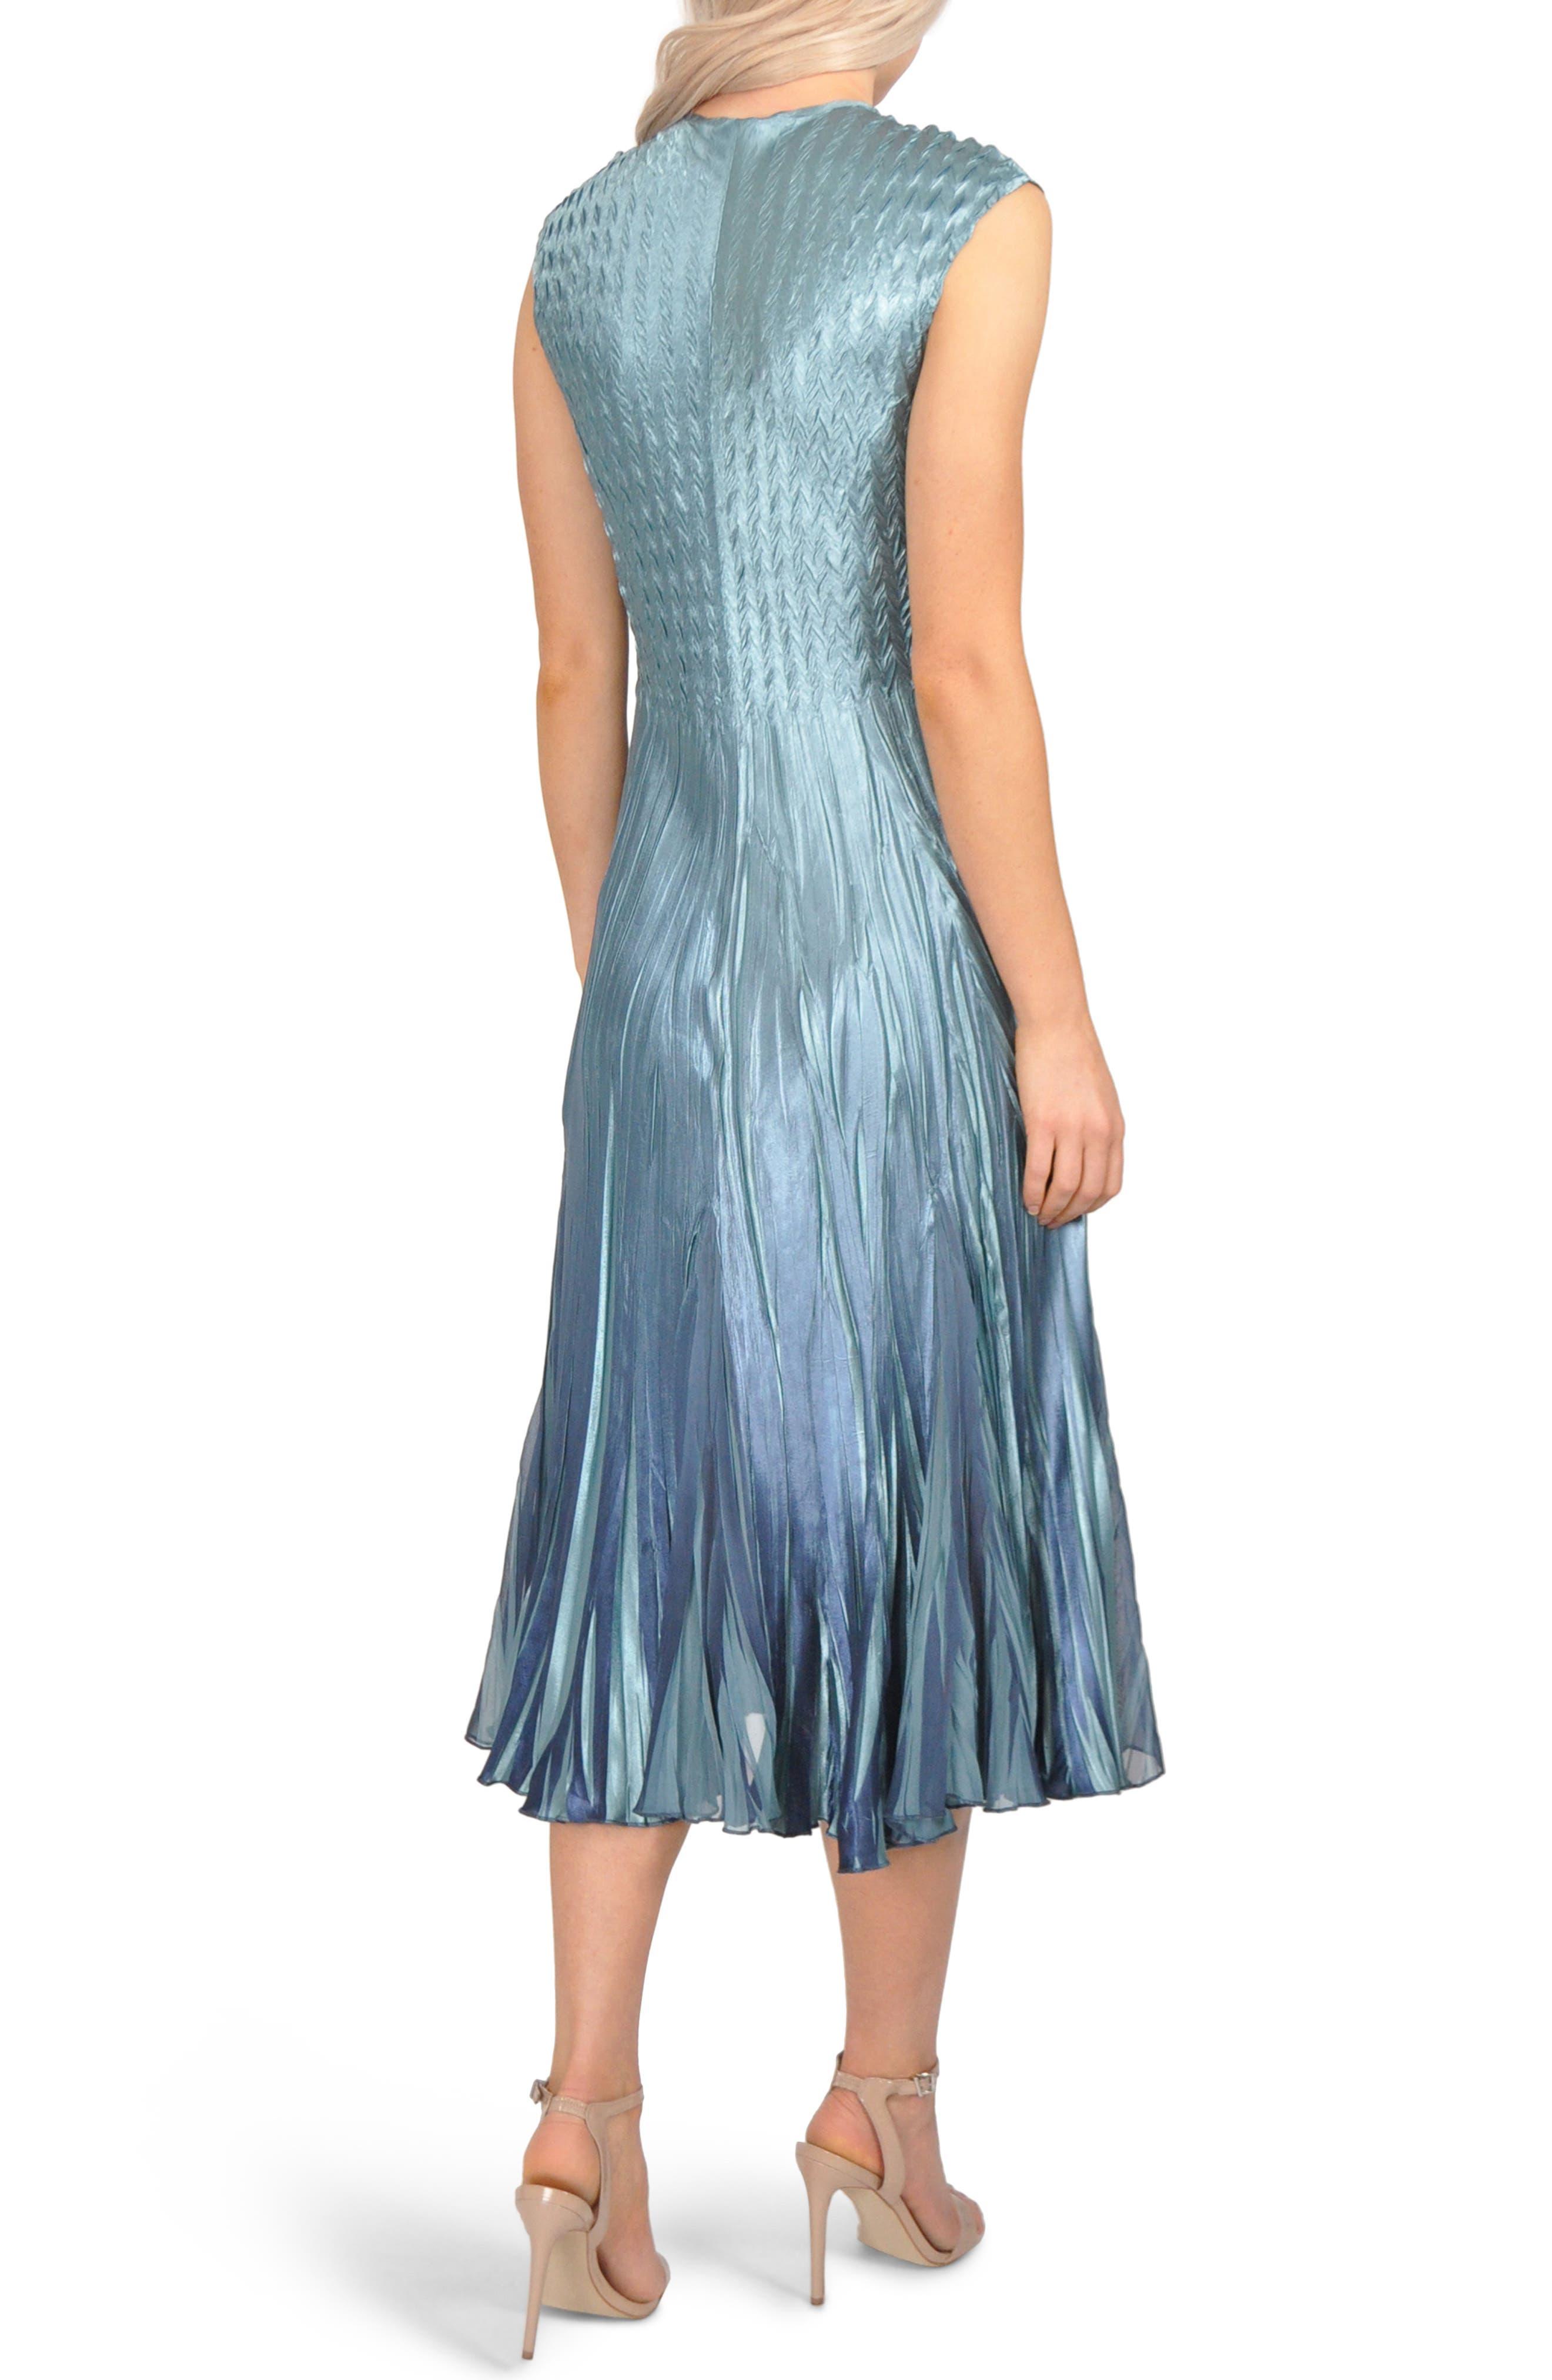 KOMAROV, Embellished Pleat Mixed Media Dress with Jacket, Alternate thumbnail 4, color, 405